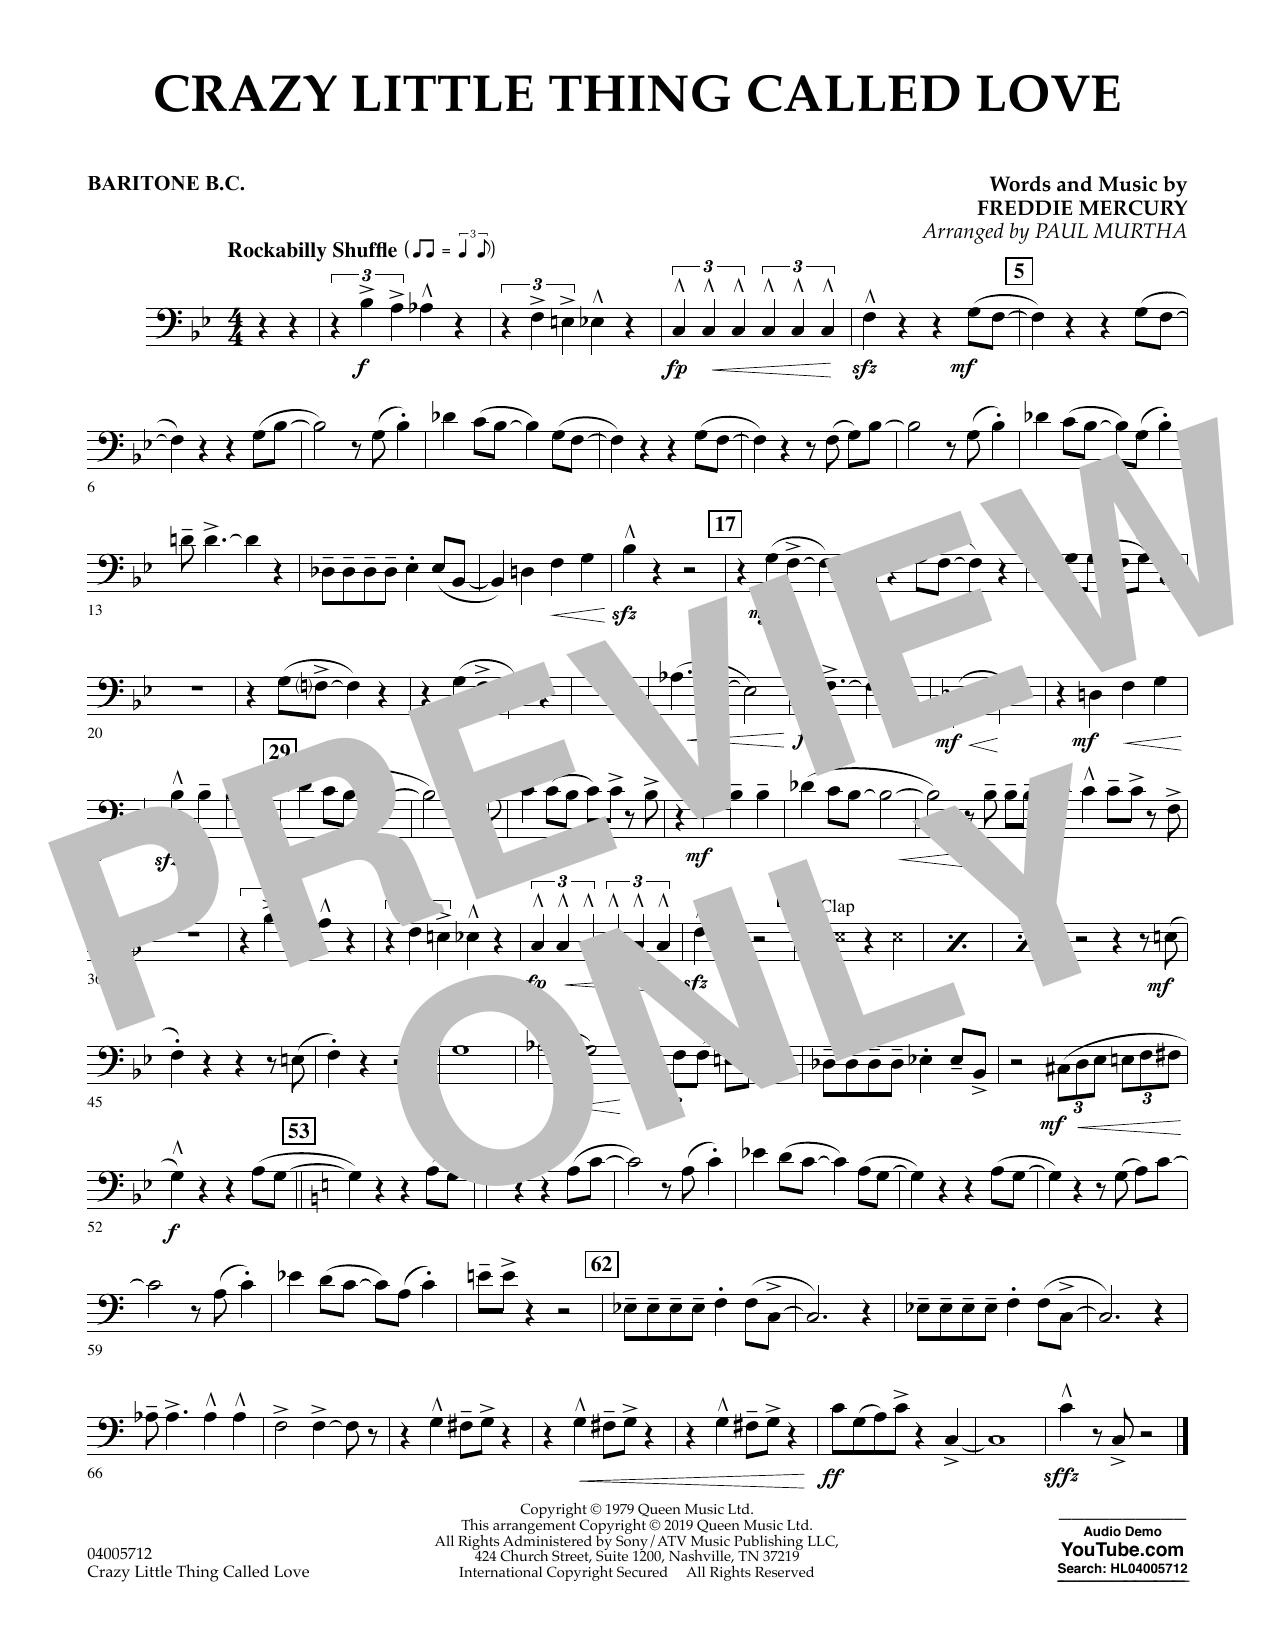 Crazy Little Thing Called Love (arr. Paul Murtha) - Baritone B.C. (Concert Band)